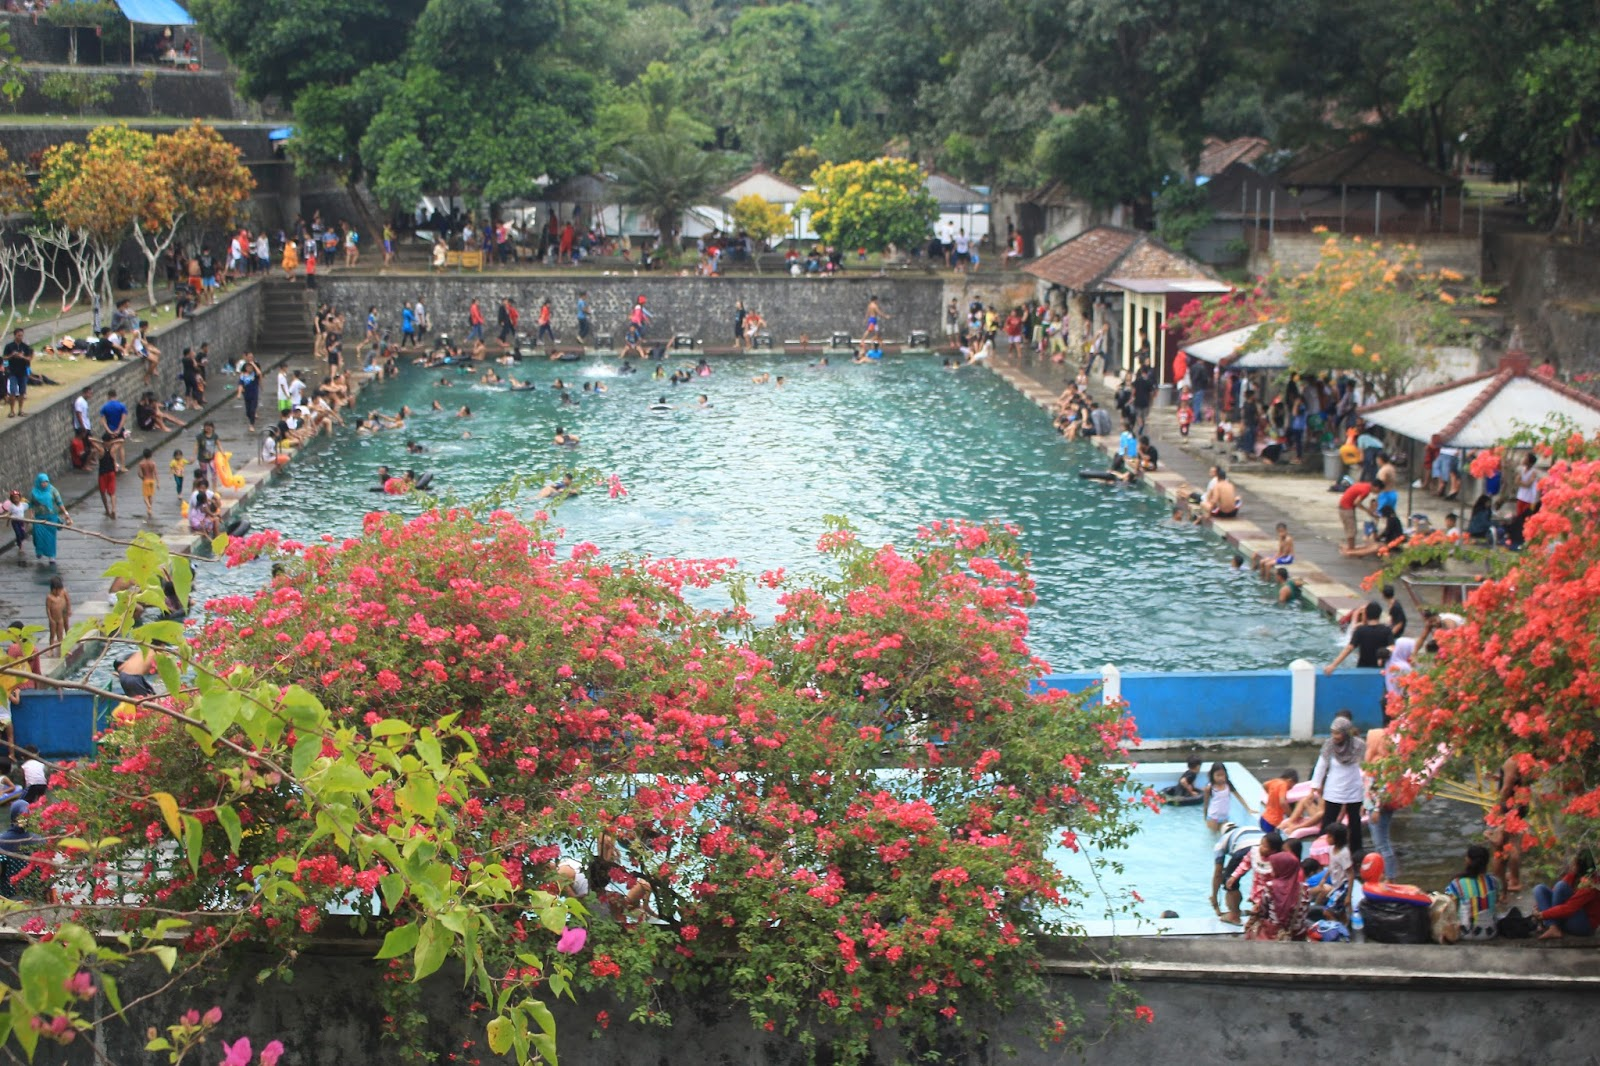 Wisata Kolam Pemandian Narmada Dilengkapi Taman Indah Aik Bukak Kab